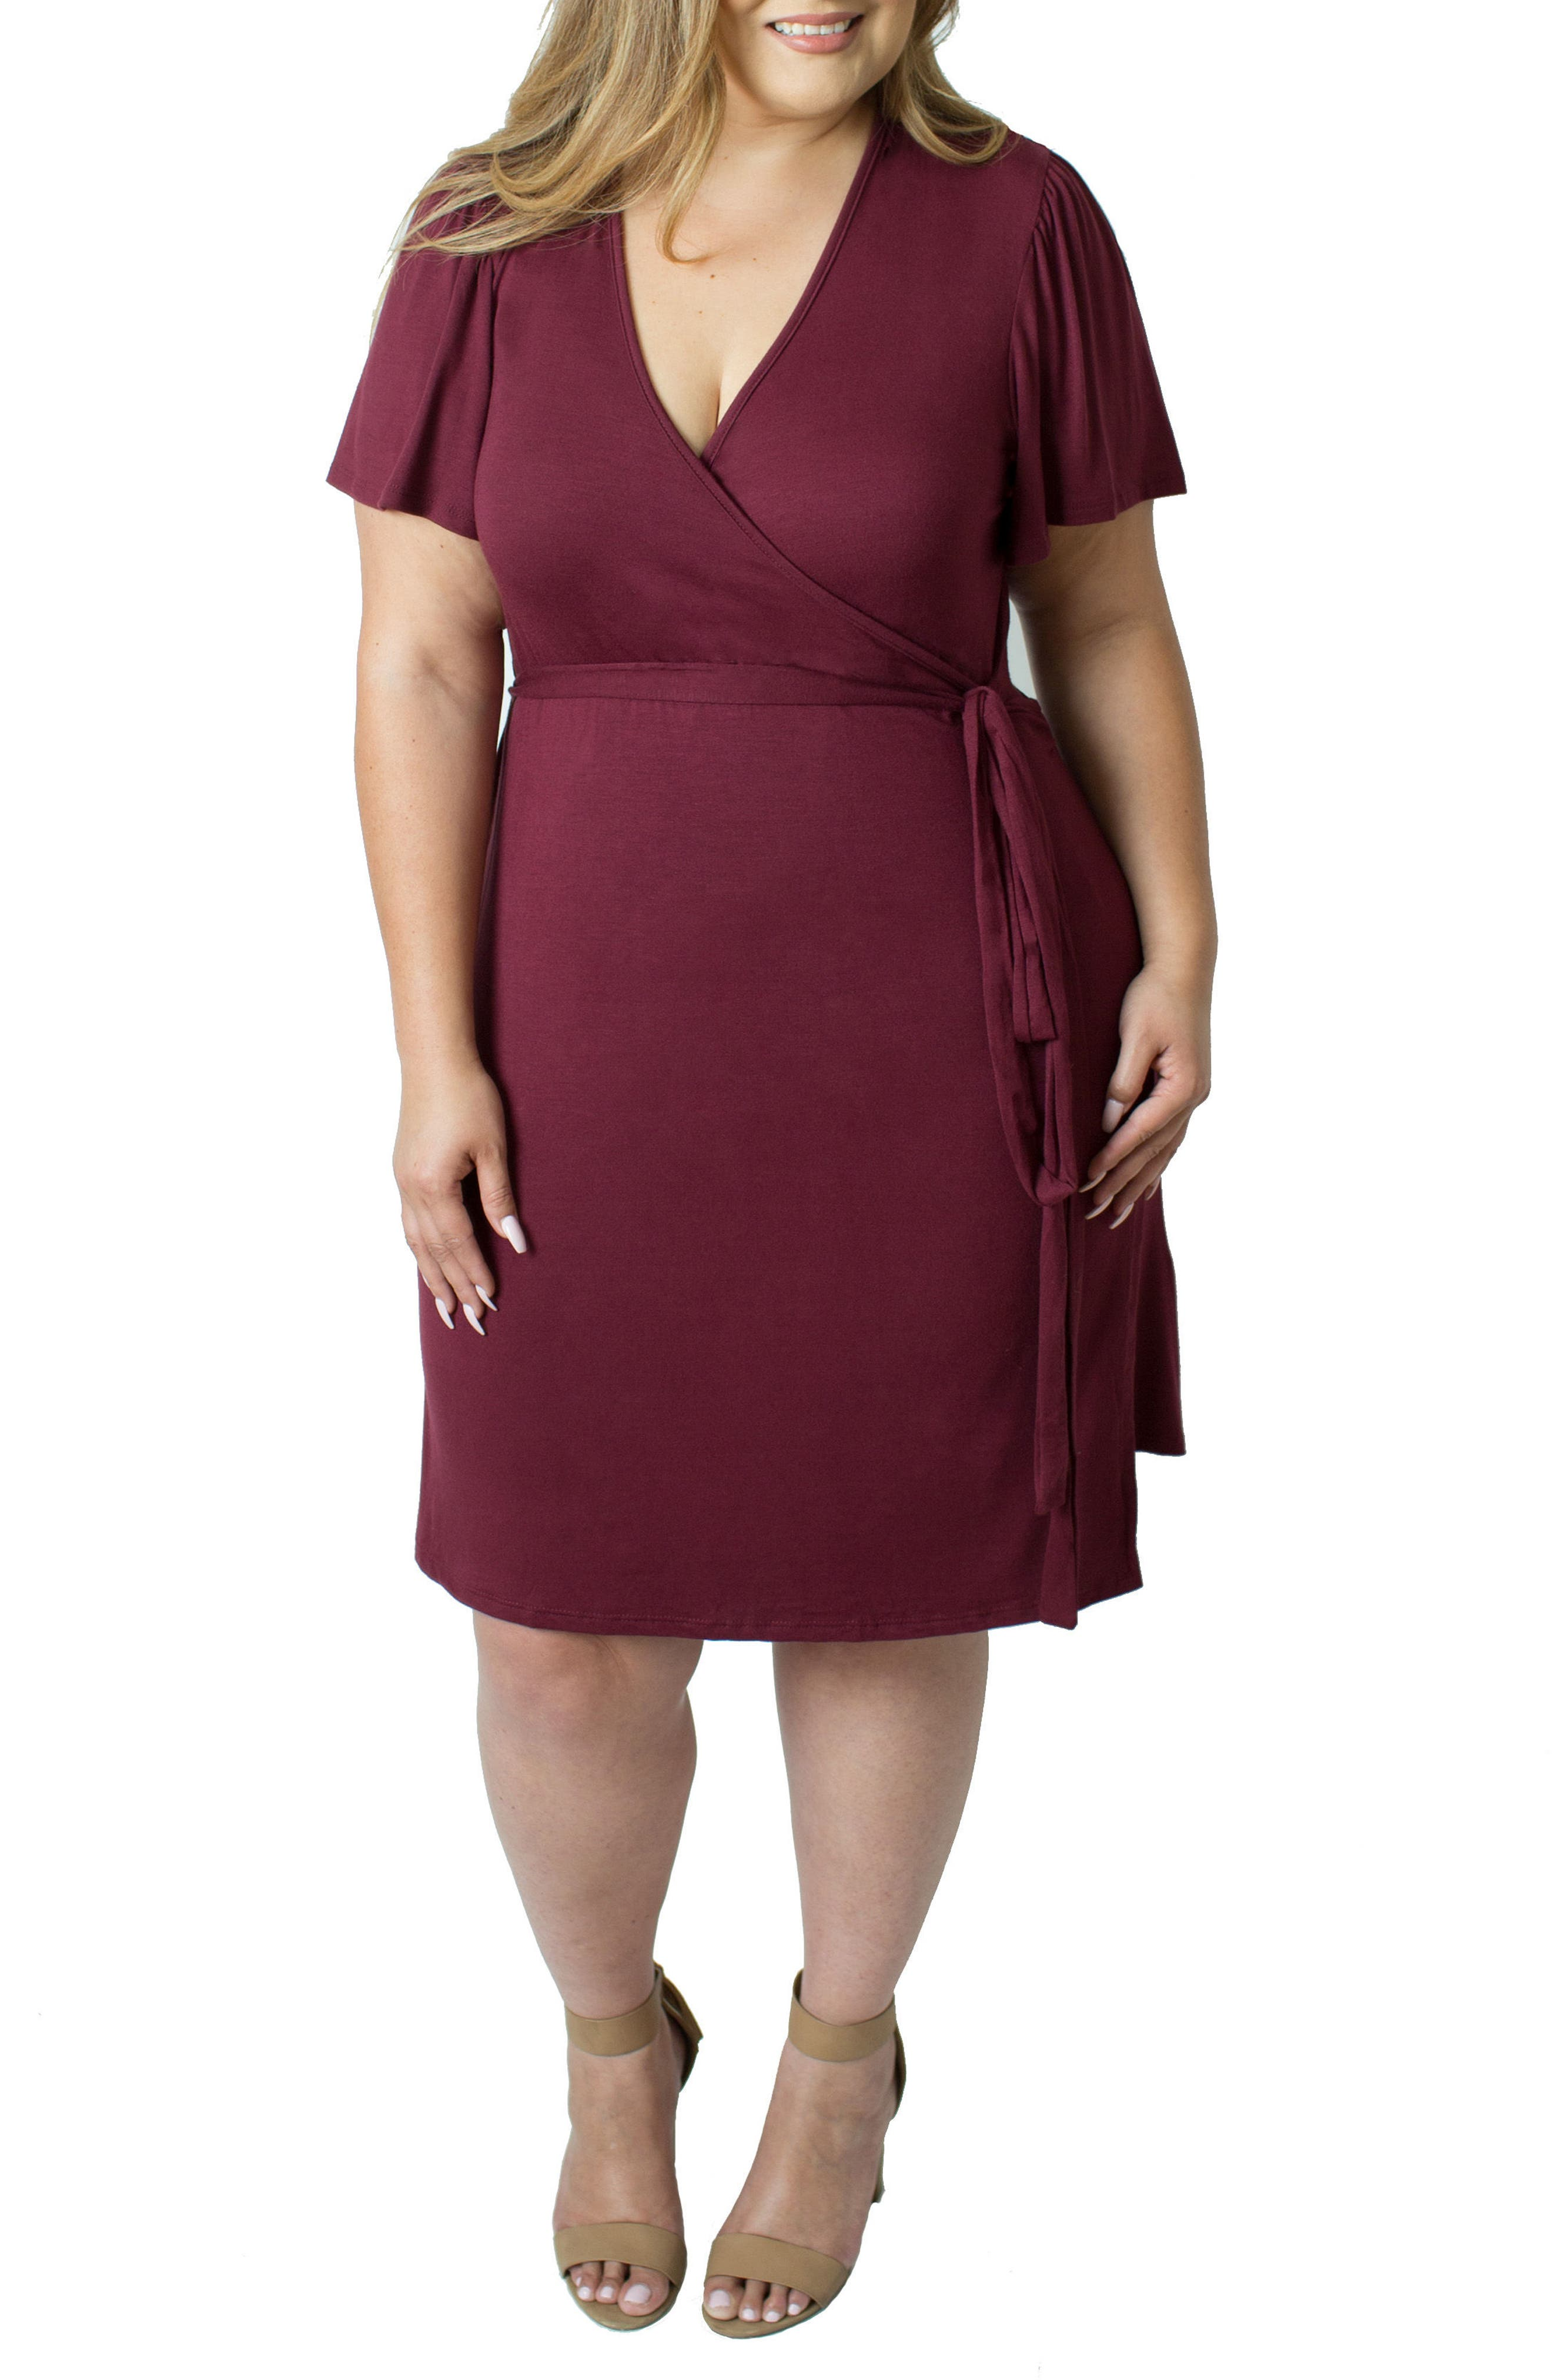 Plus Size Udderly Hot Mama Wrap Maternity/nursing Dress, (1-16W US) - Red